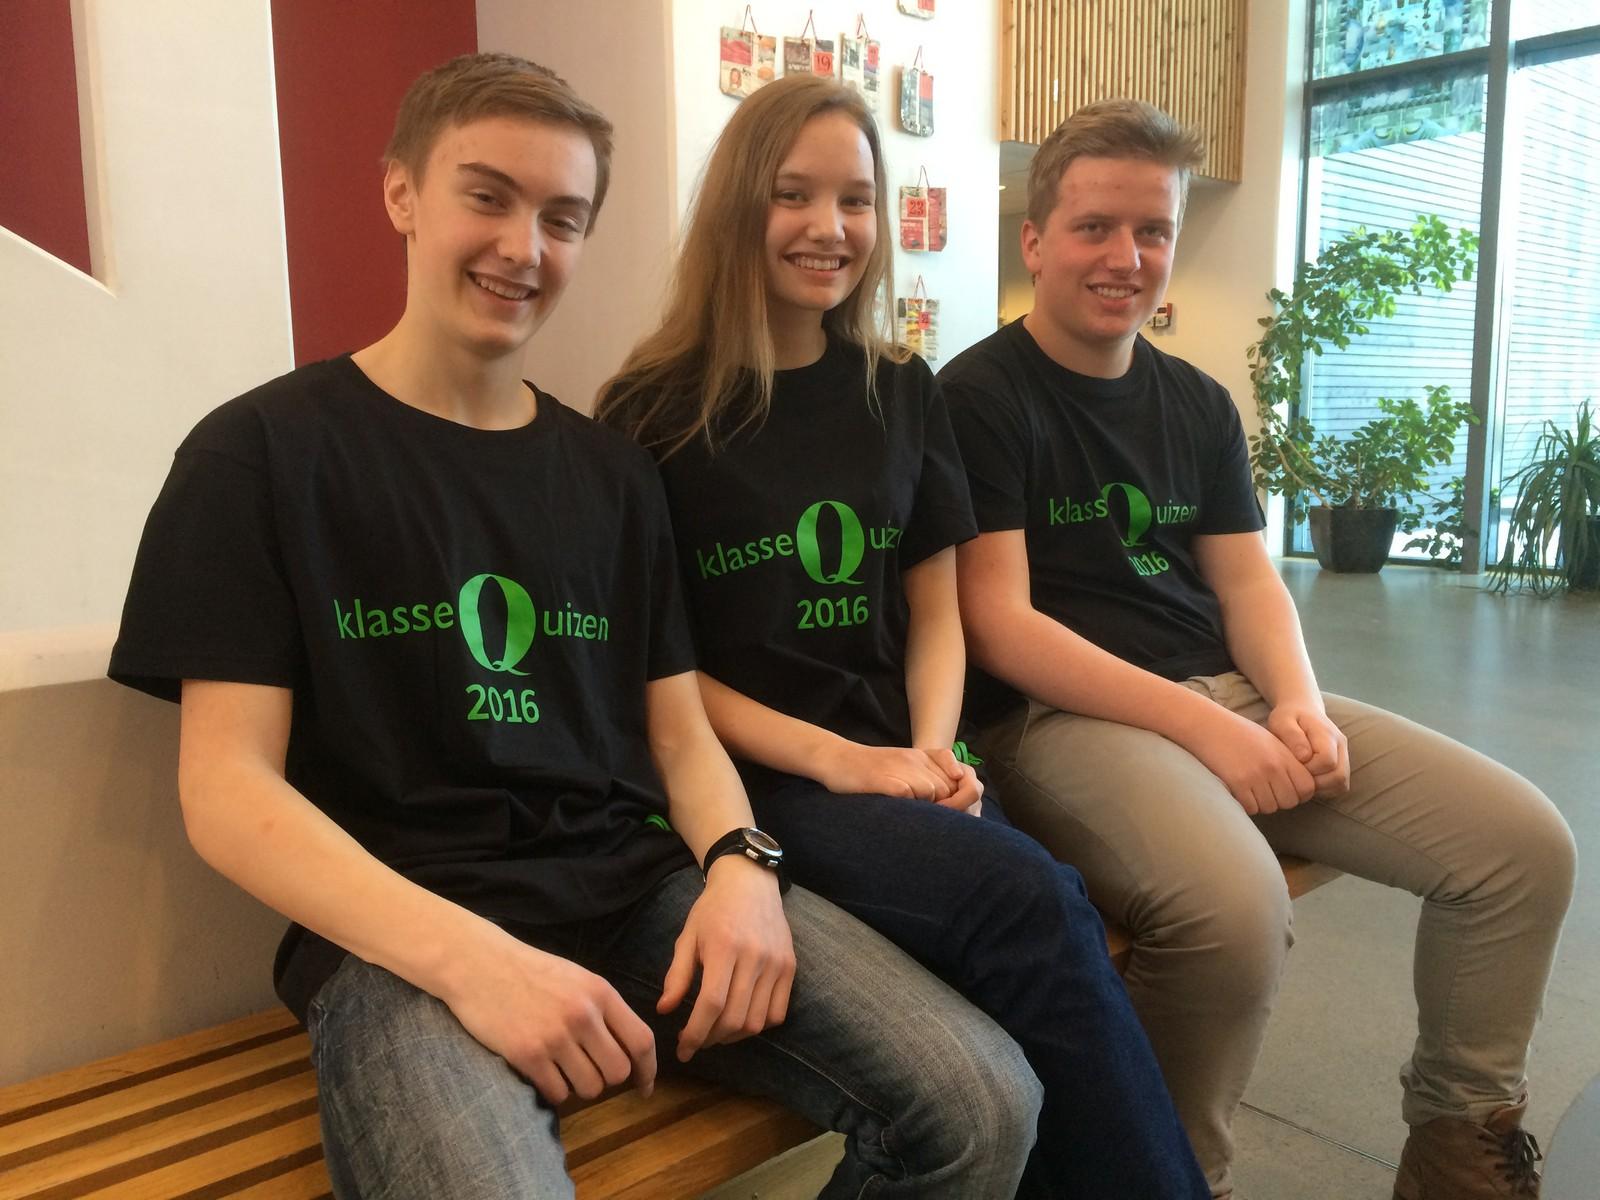 Ener ungdomsskole fra Hamar klarte 11 rette i Klassequizen. F.v. Fredrik Løvbak Hagen, Elisabeth Halvorsen og Fredrik Sveen.